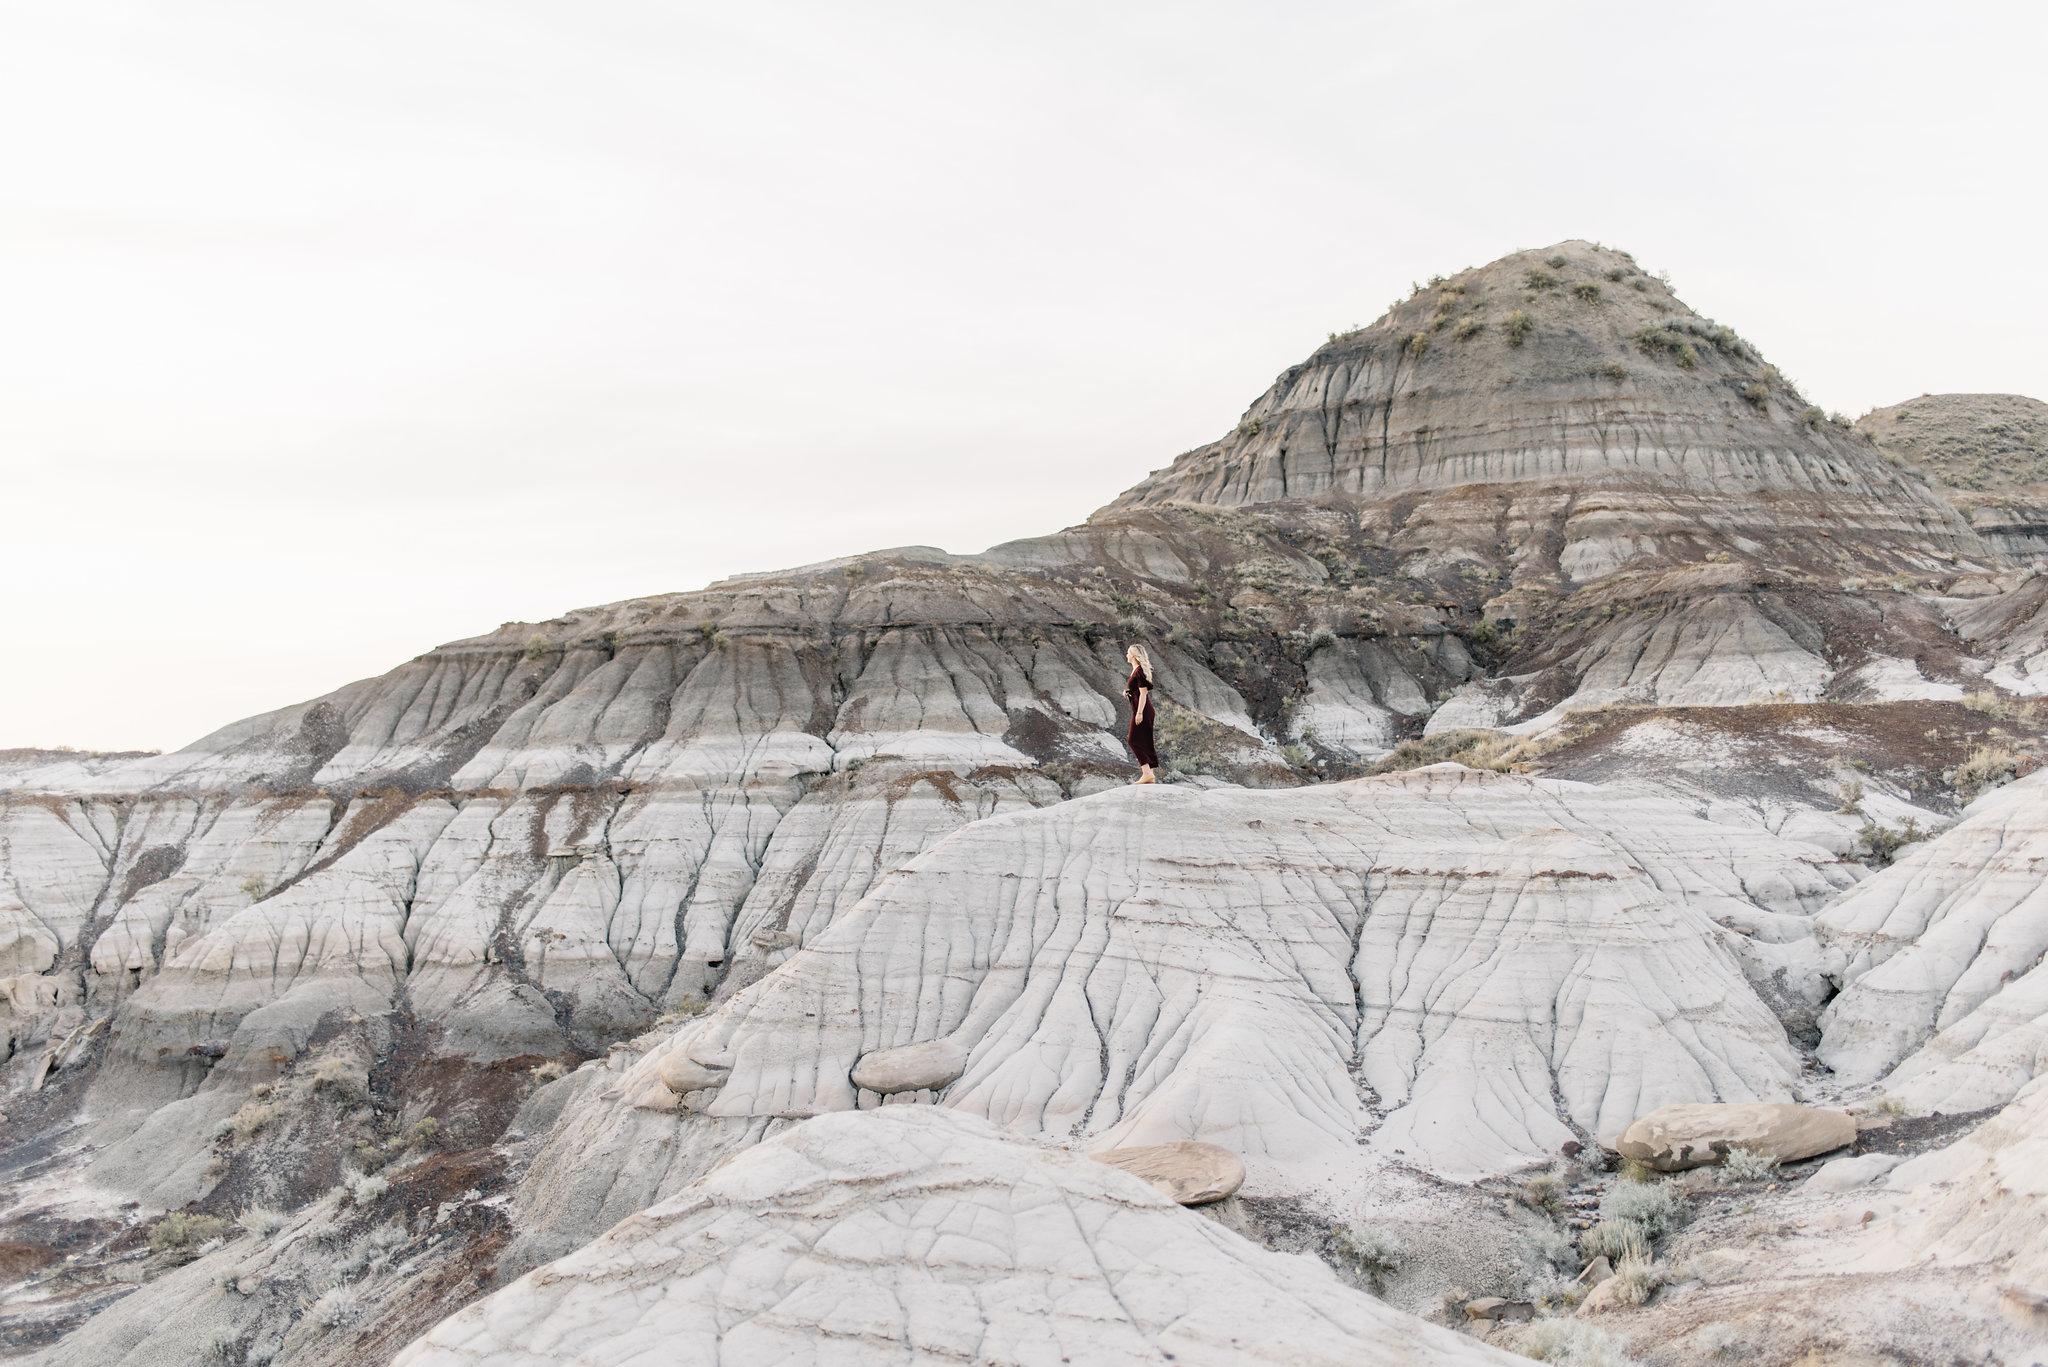 drumheller photos, plum jumpsuit for fall